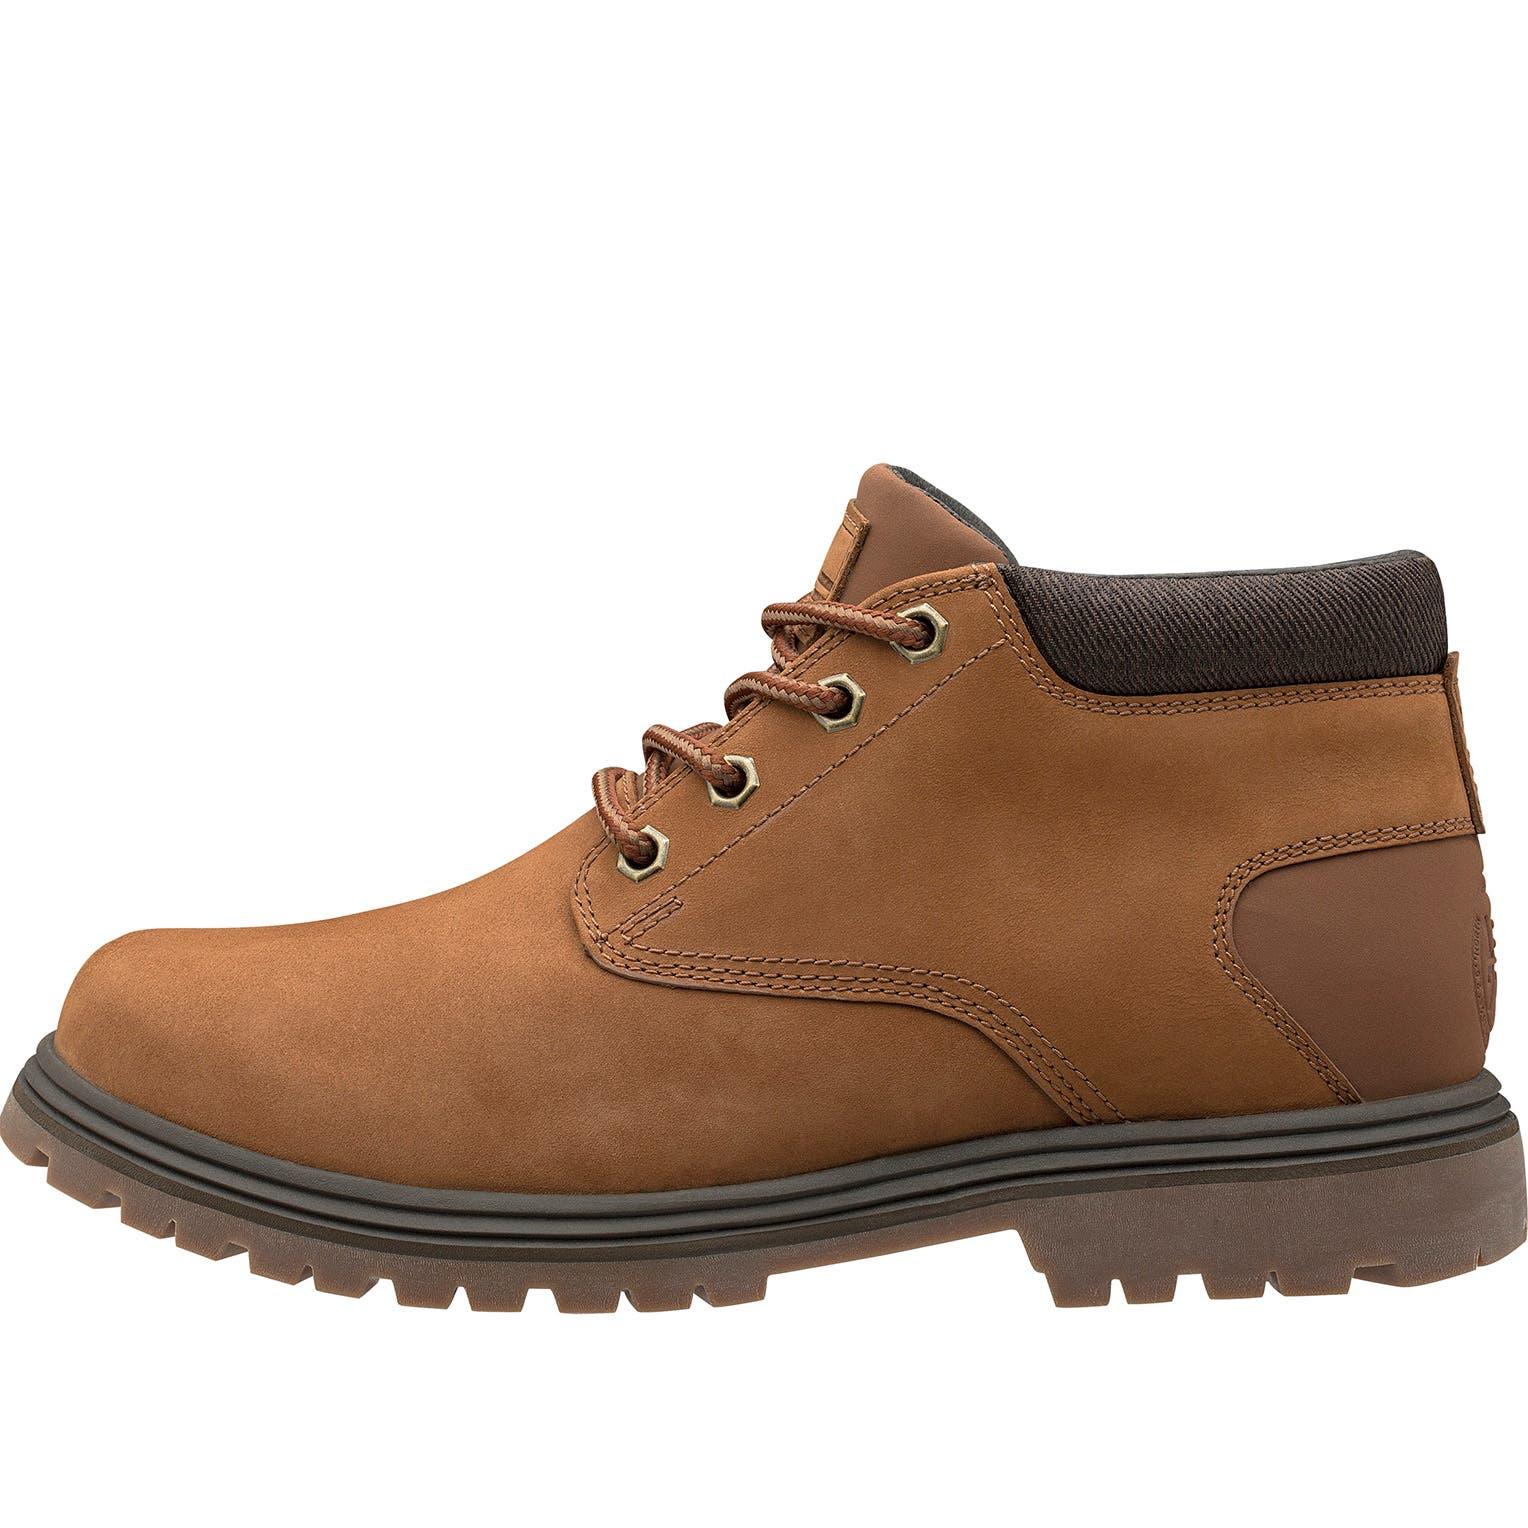 Helly Hansen Saddleback Chukka Boot Men's